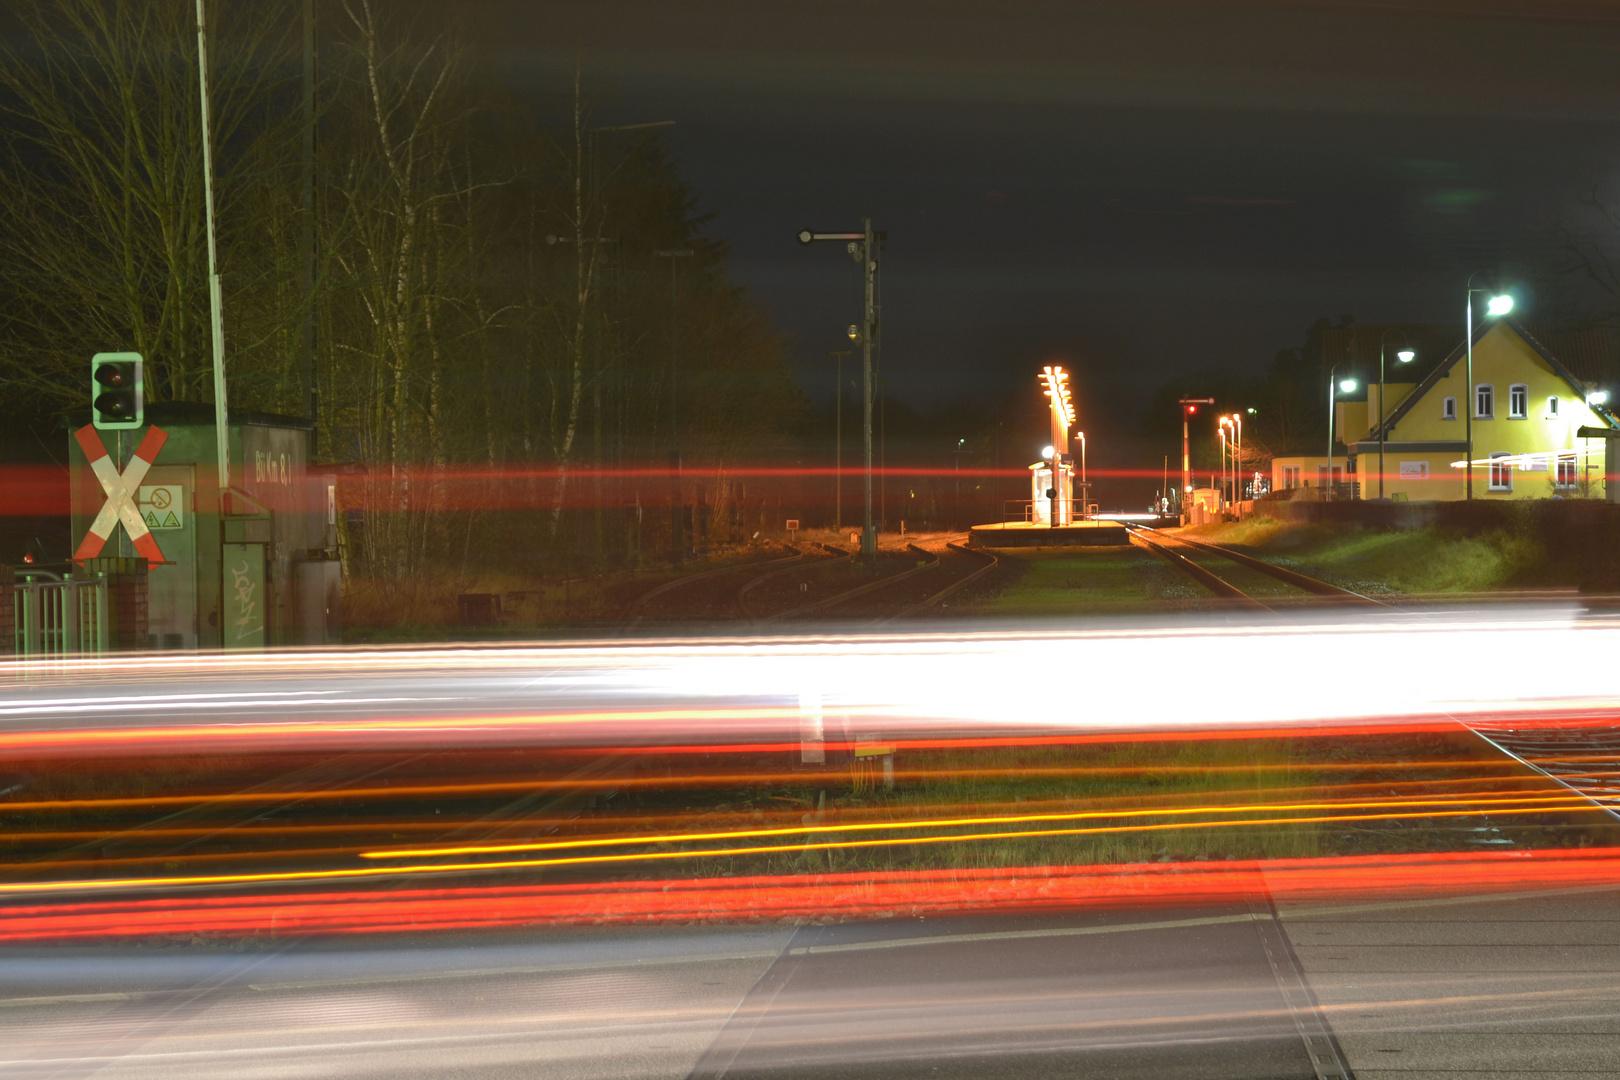 Abends am Bahnübergang